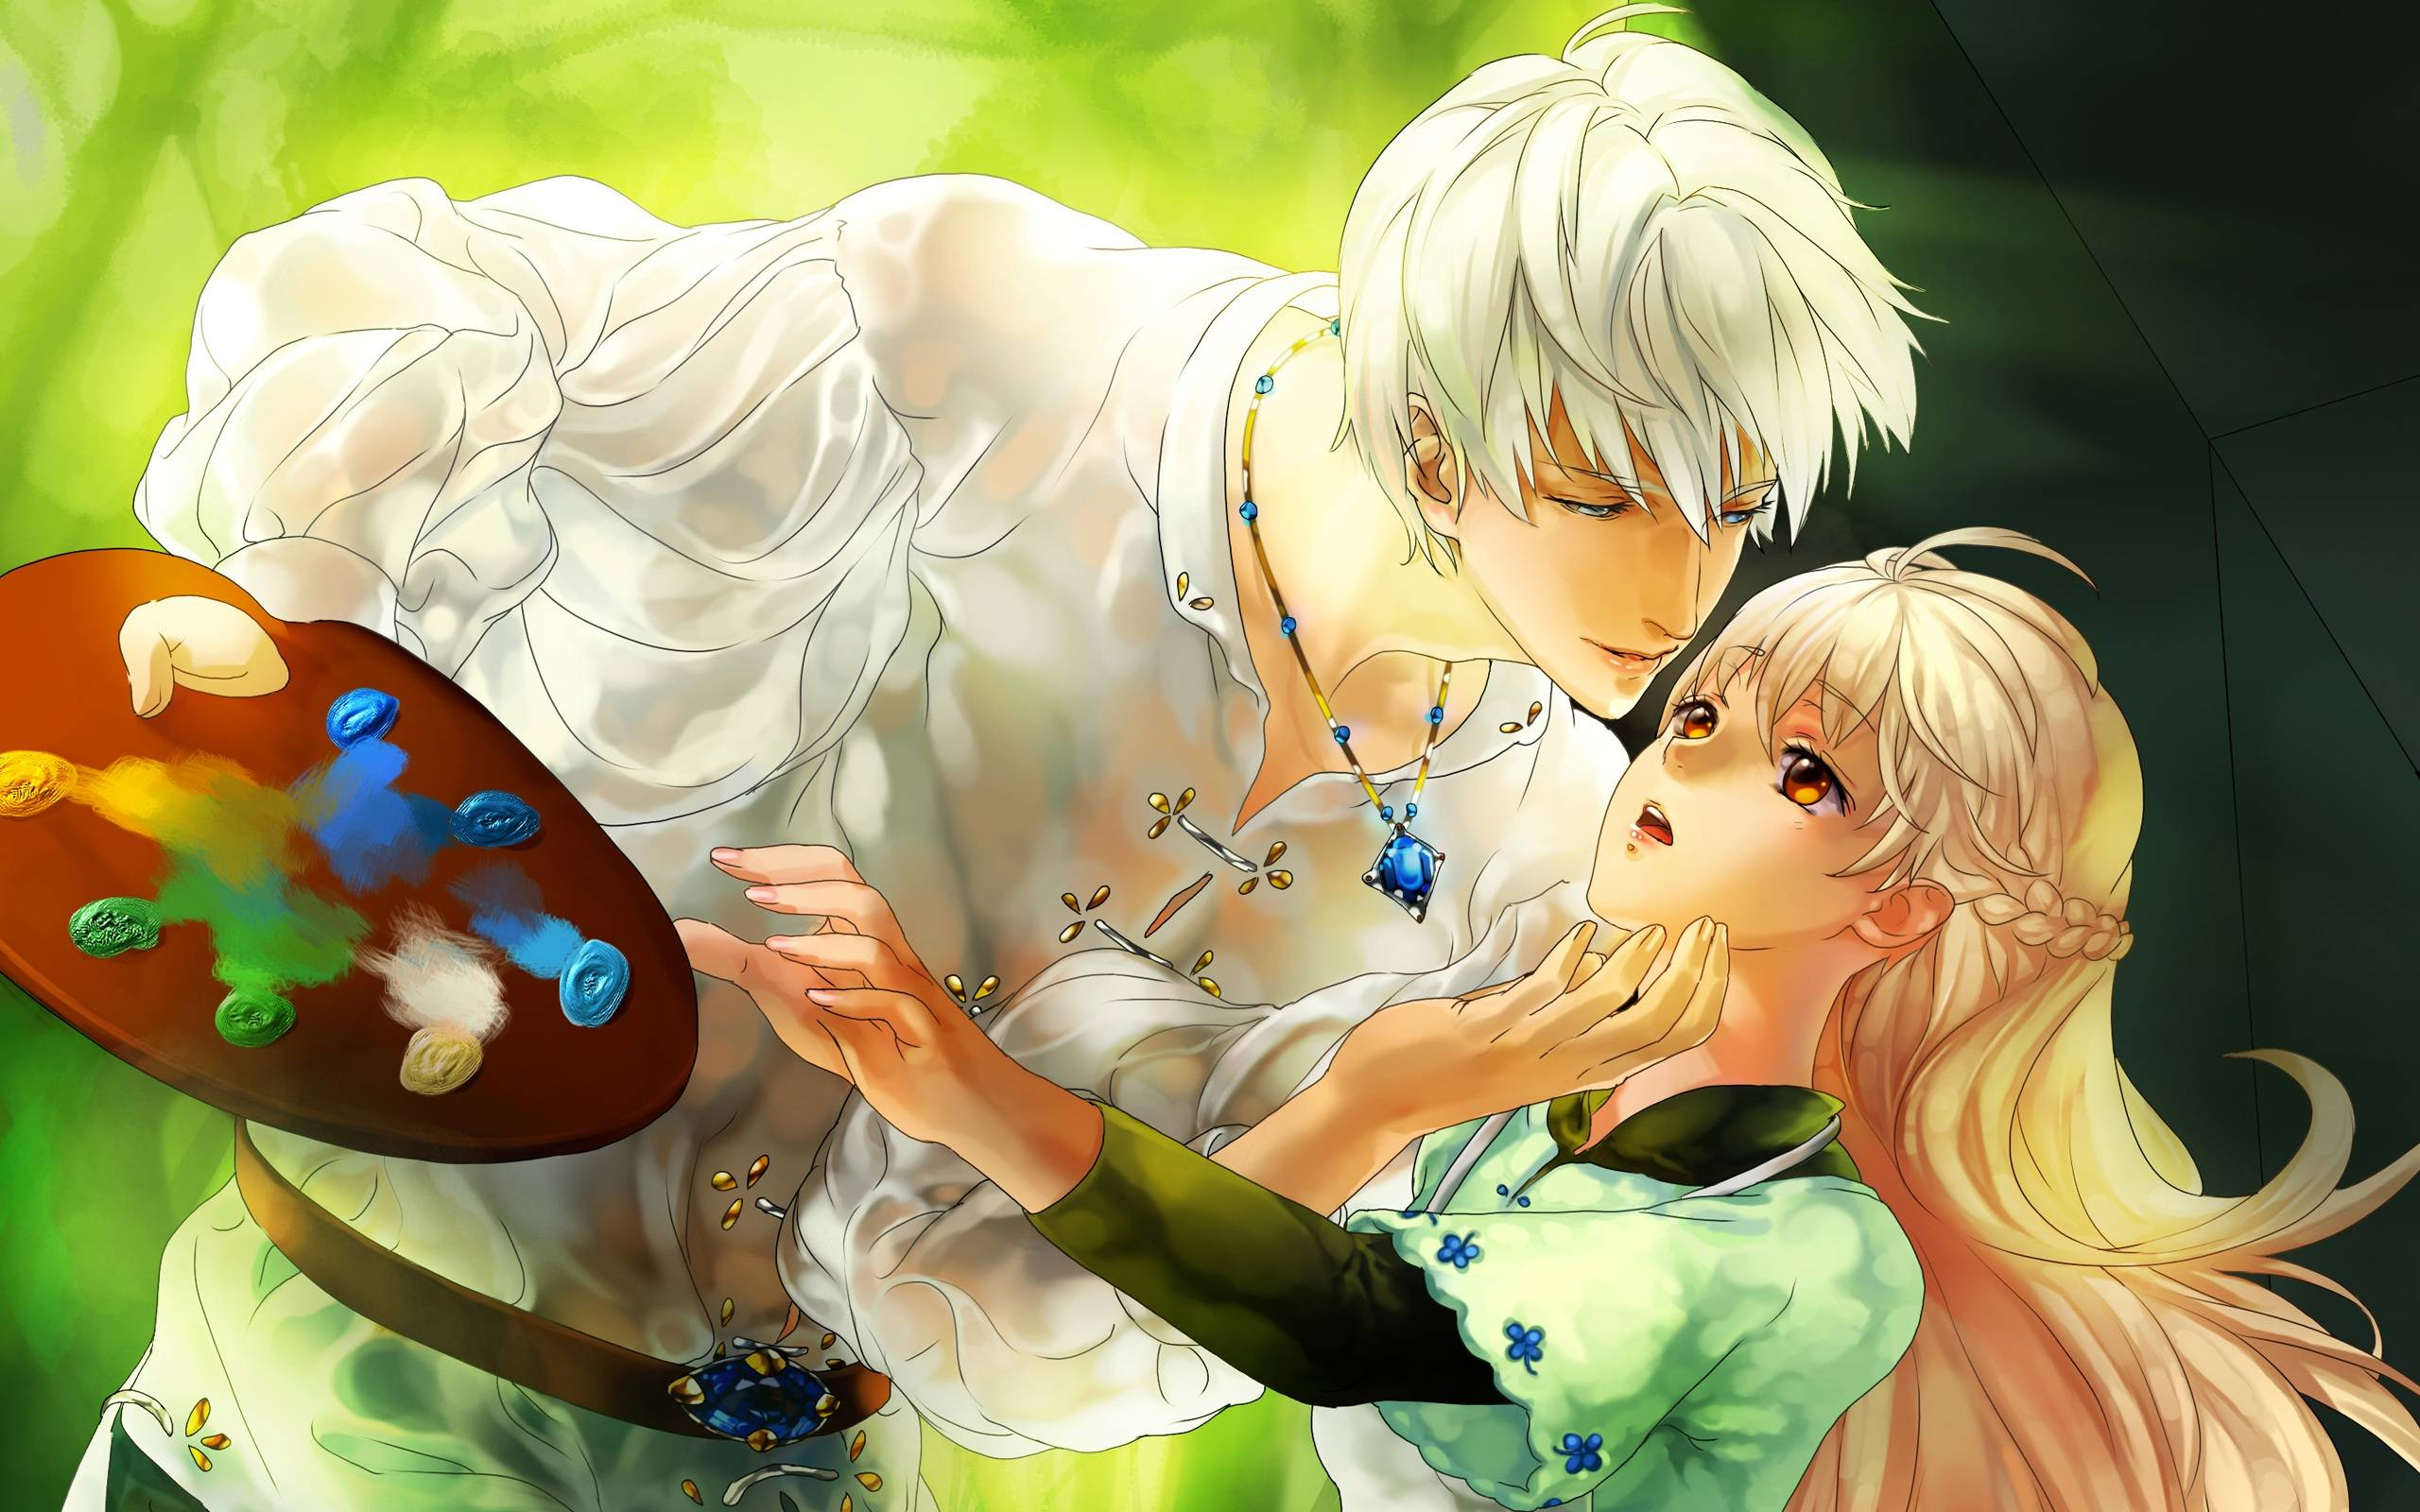 Anime Couples Wallpaper - WallpaperSafari